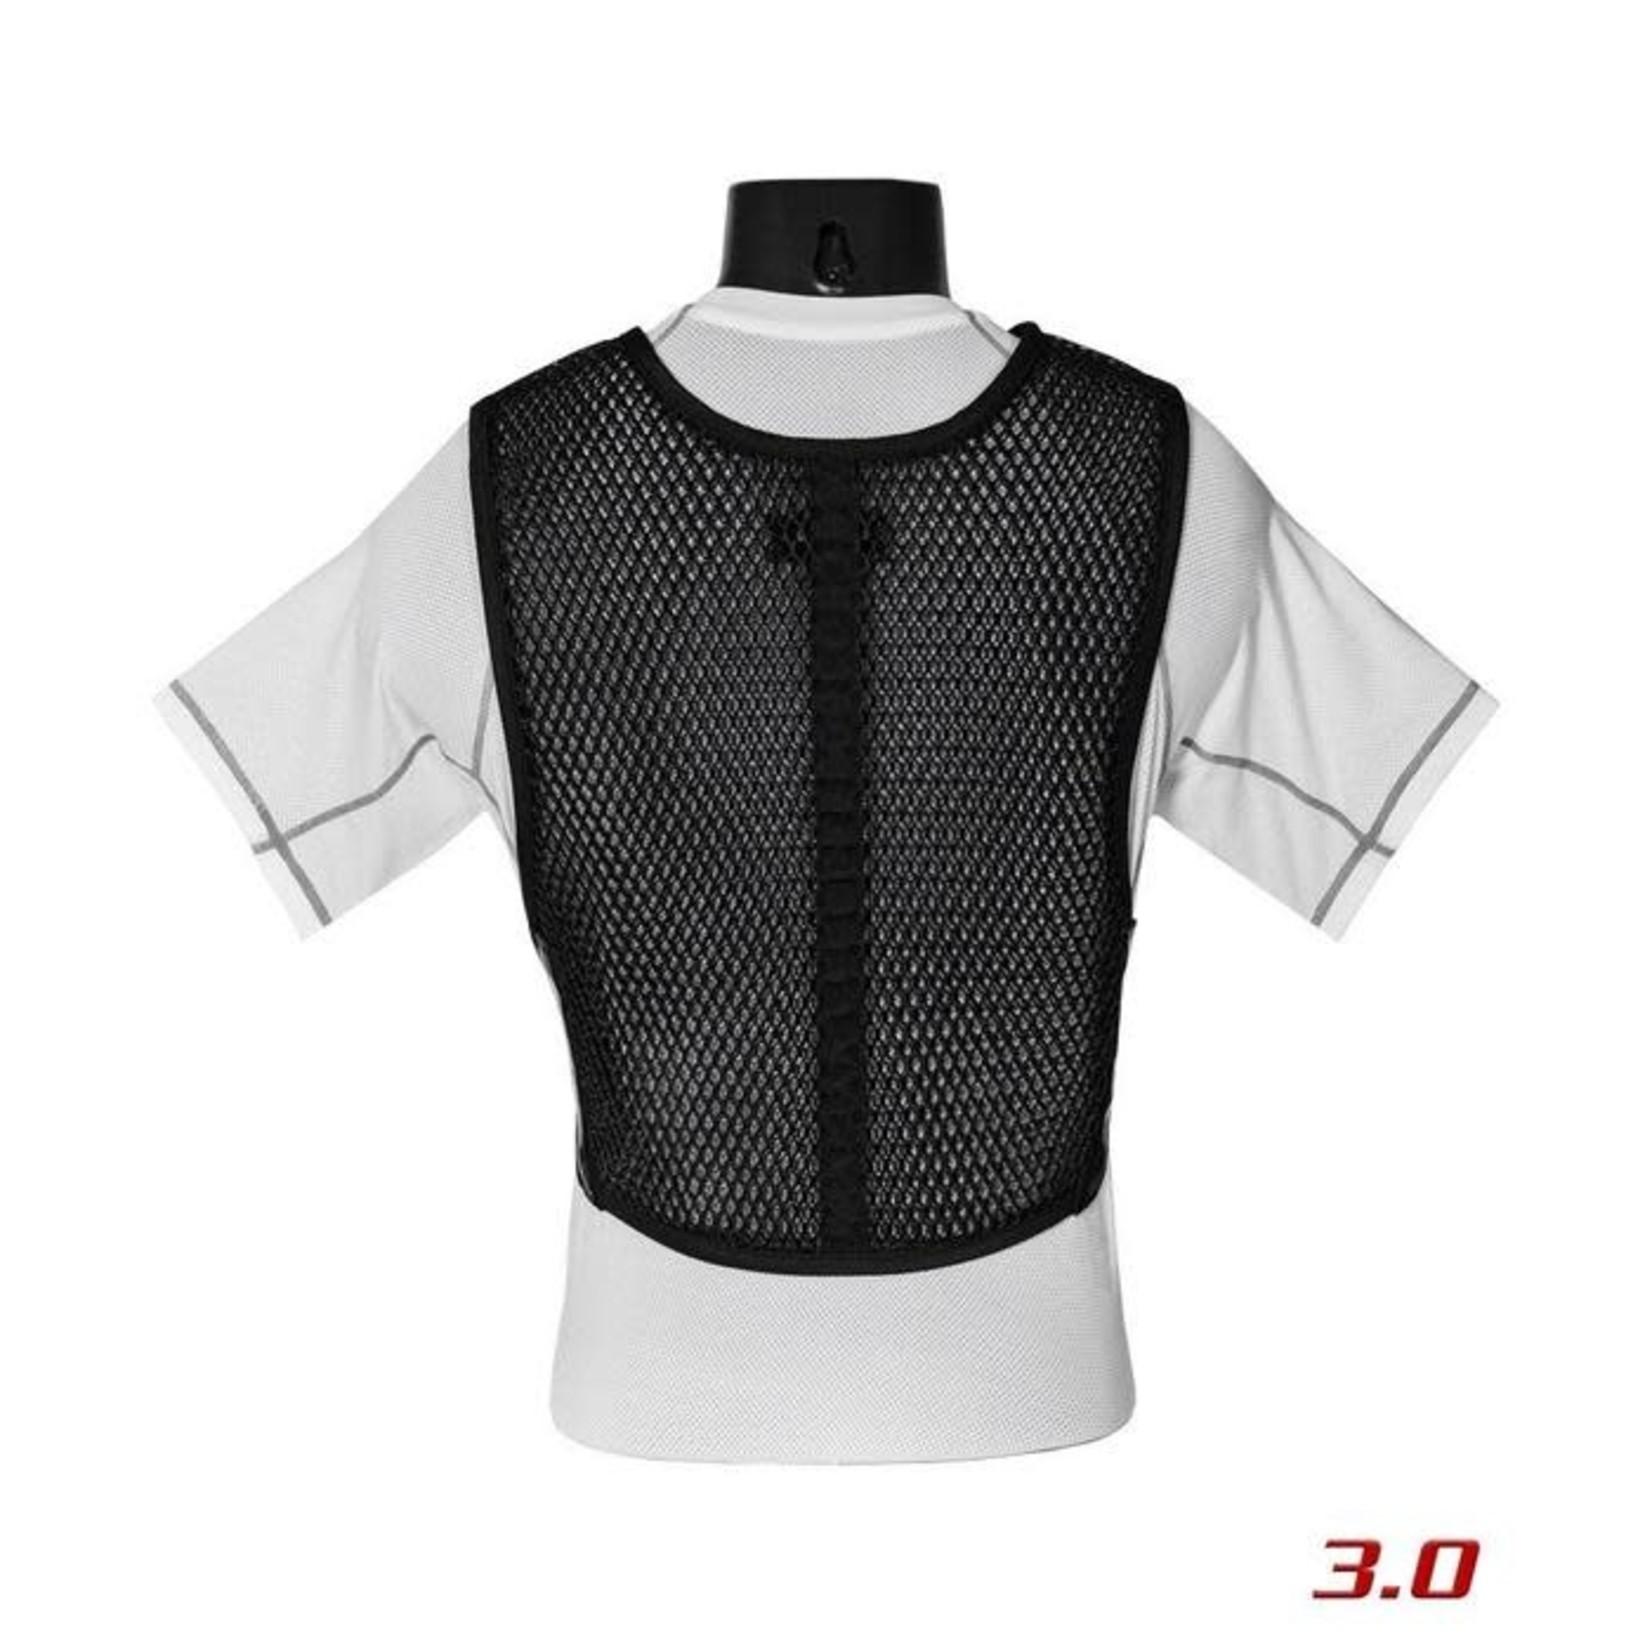 306 Tactical 221B Maxx-Dri Vest 3.0 - Extra Small/Small